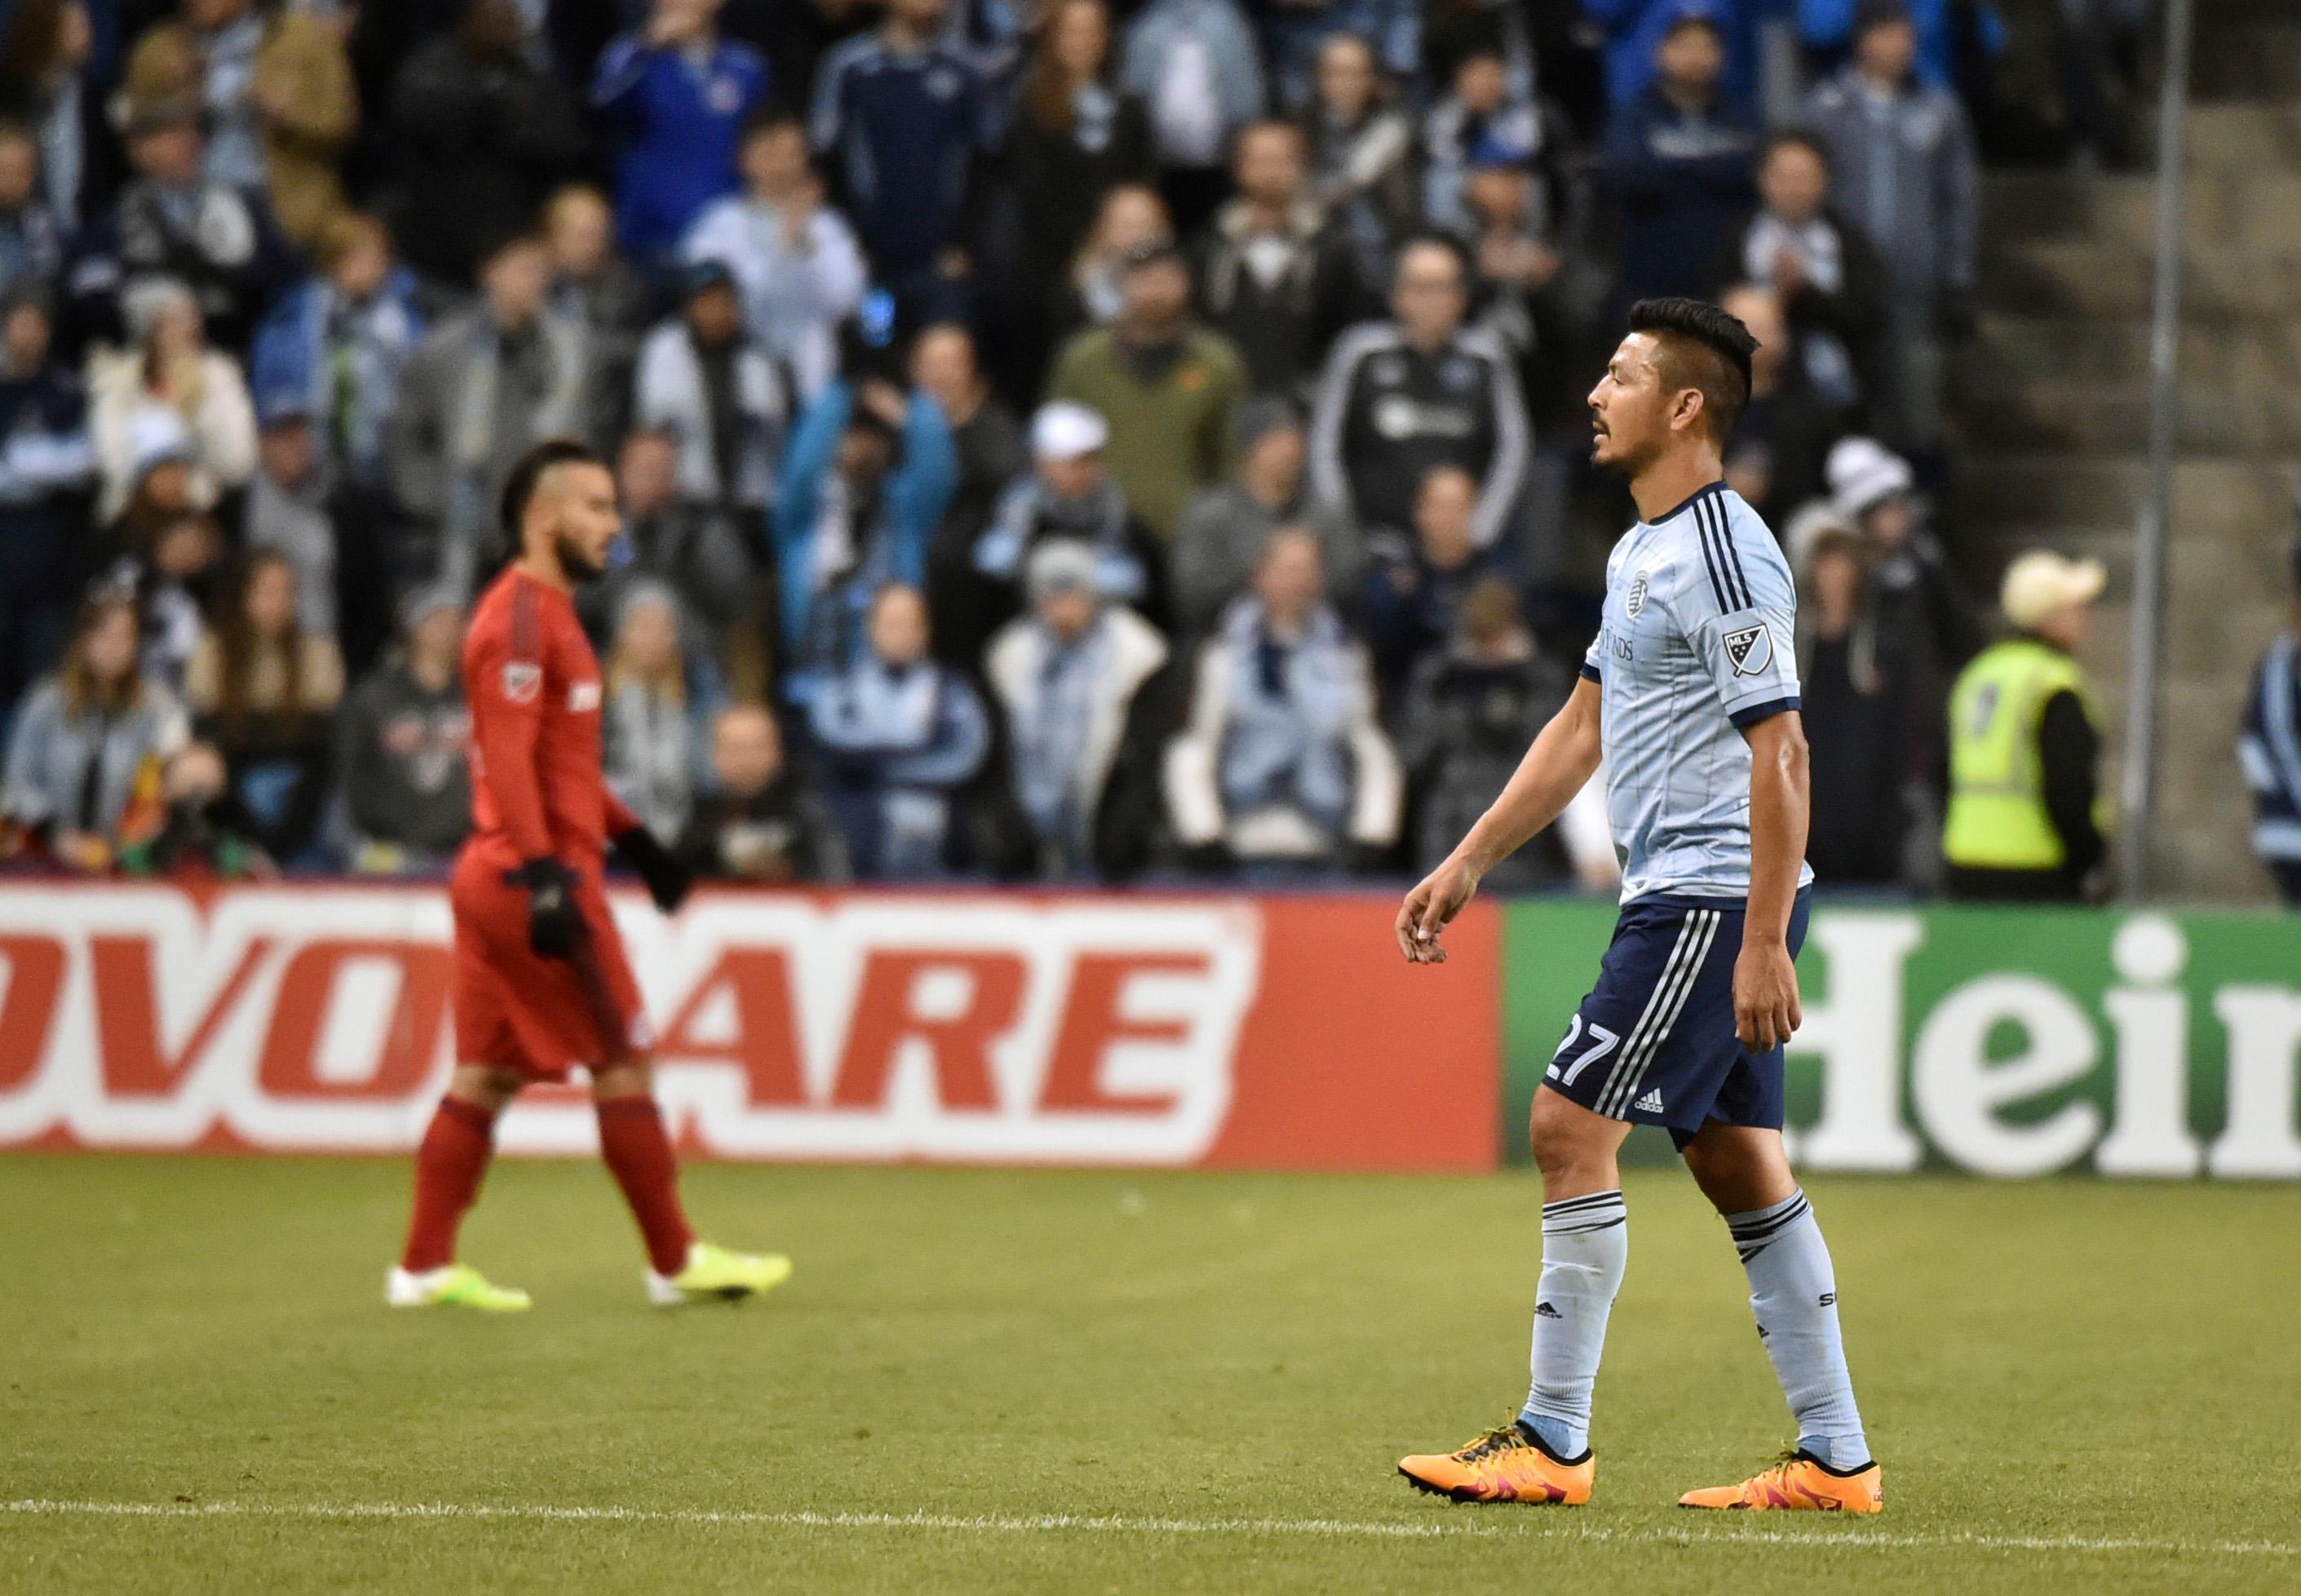 MLS: Toronto FC at Sporting KC